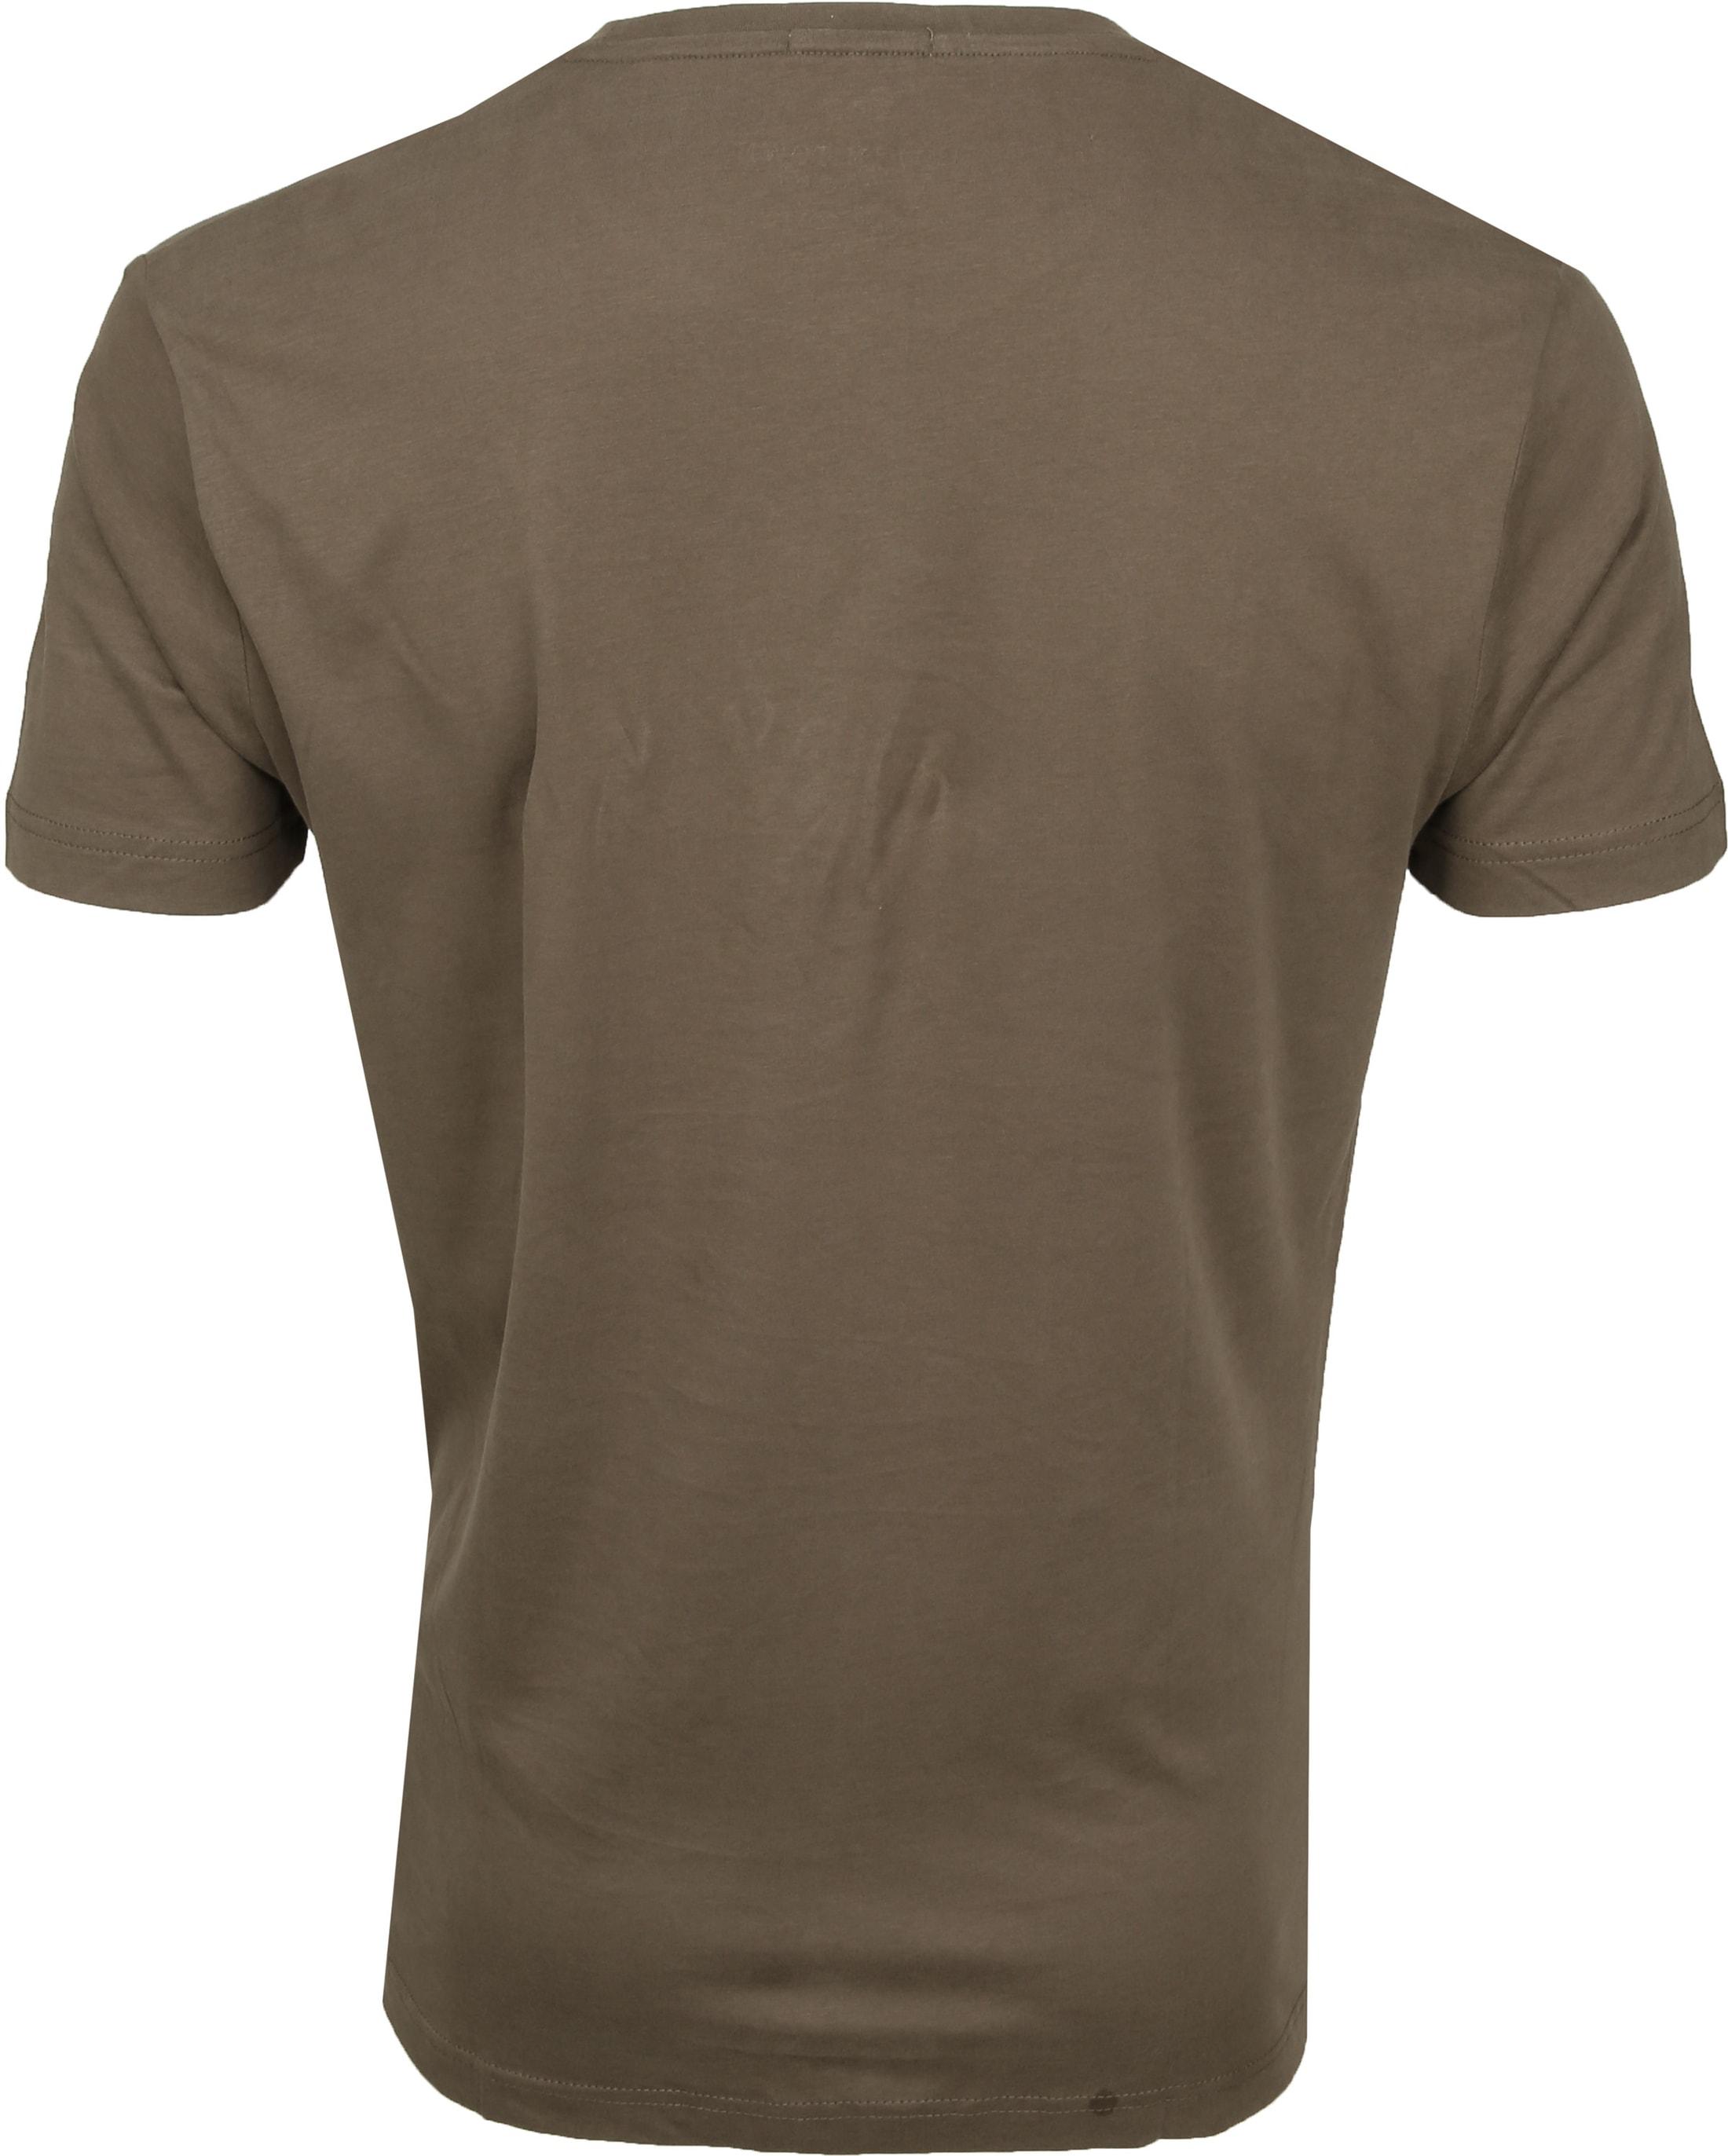 New in Town T-shirt Serafino Khaki foto 2